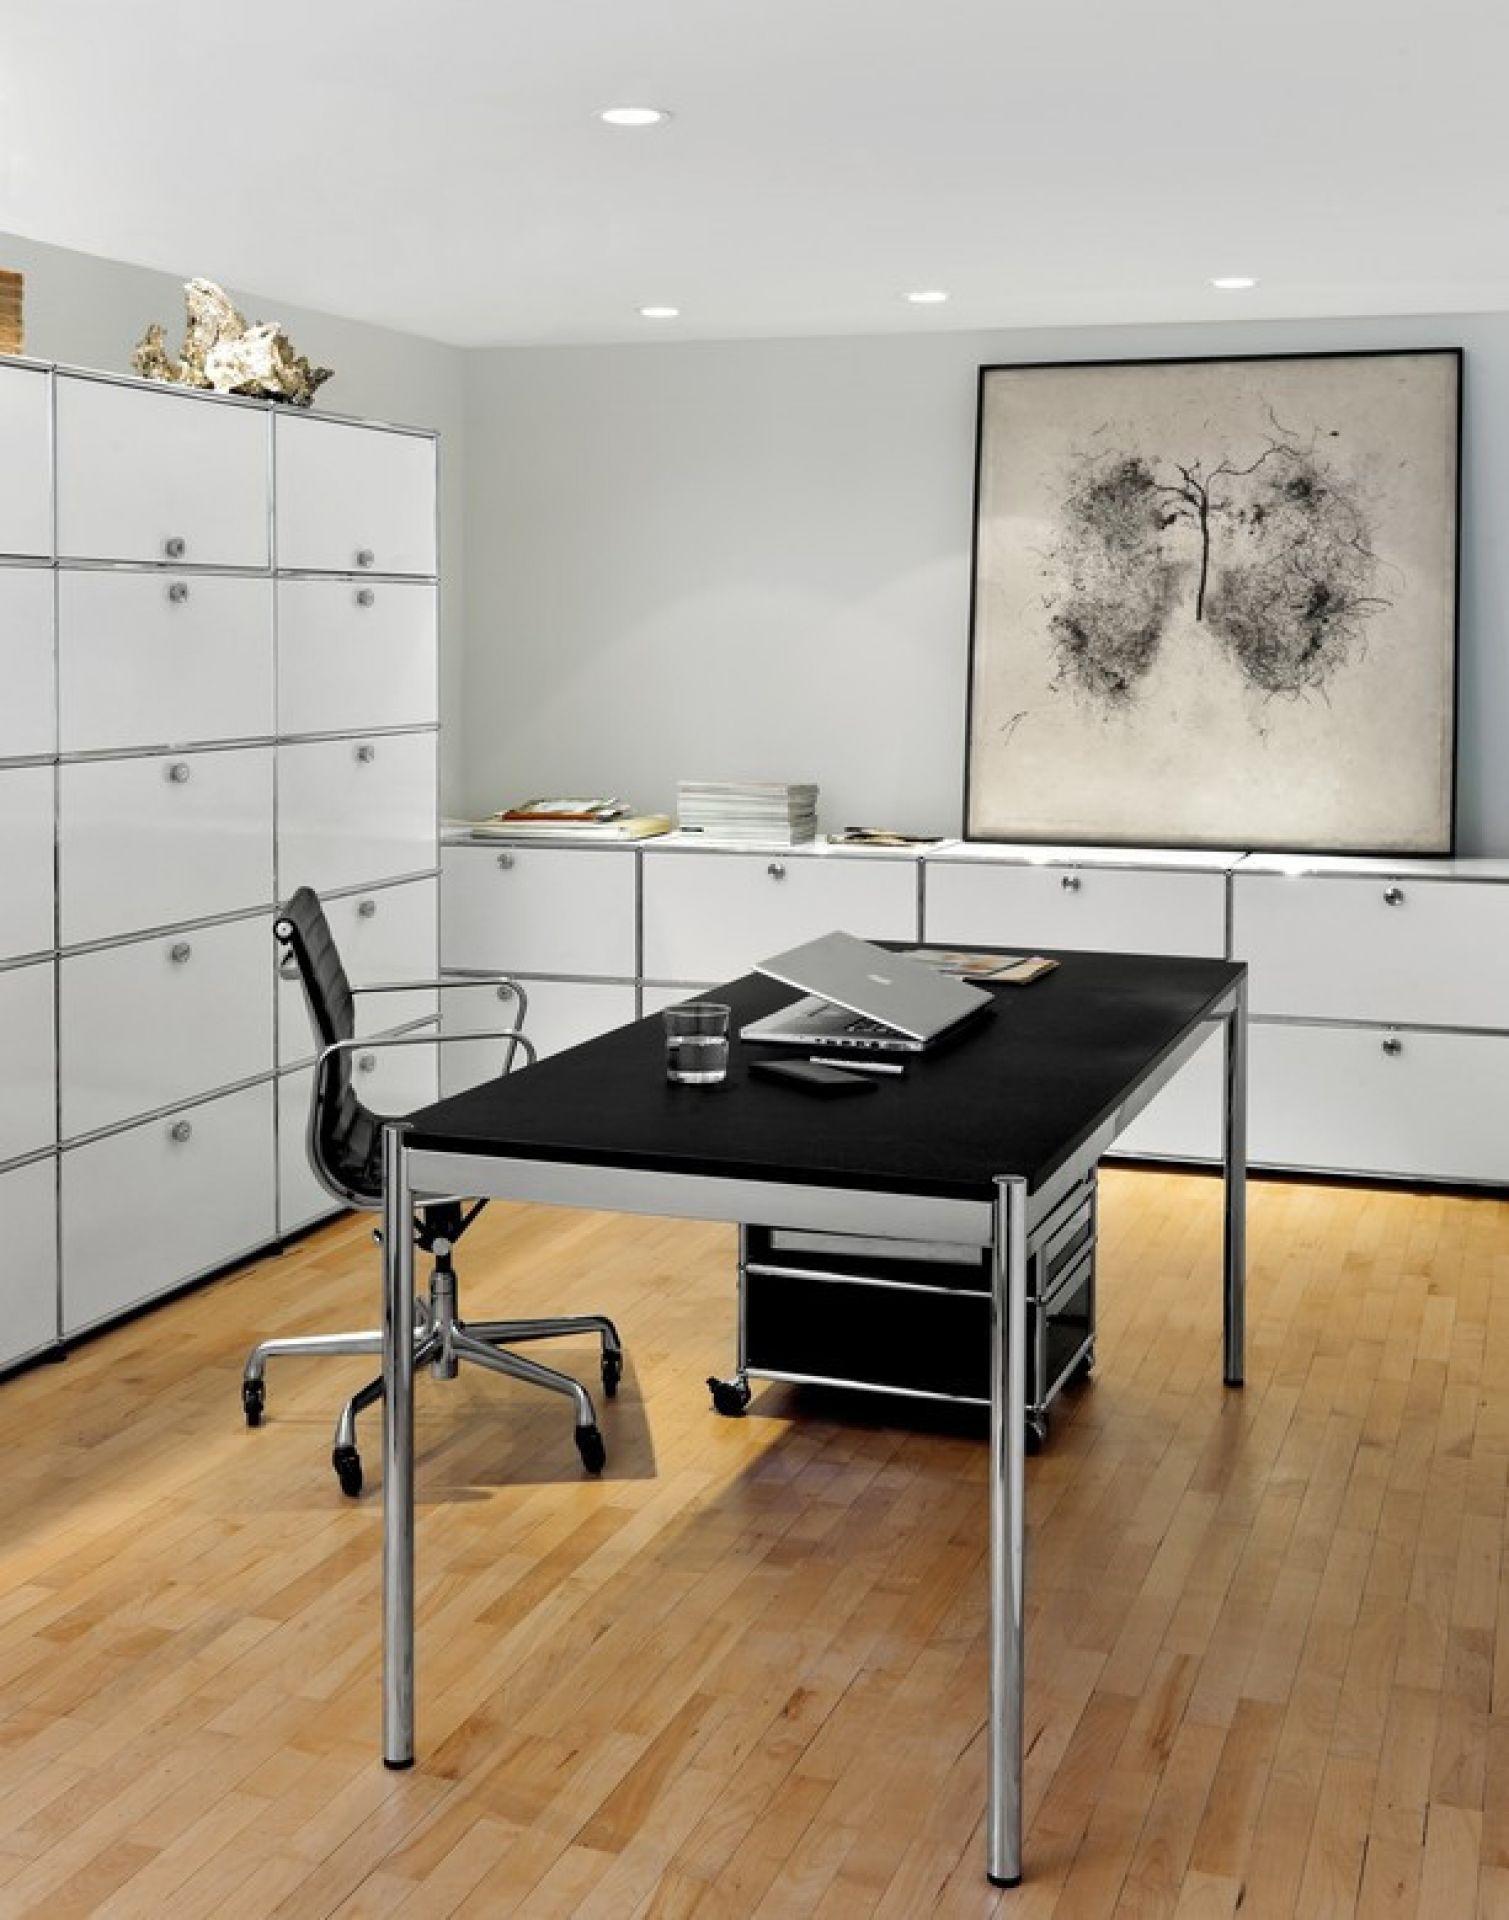 USM Haller Table 175 x 75 cm pearl grey